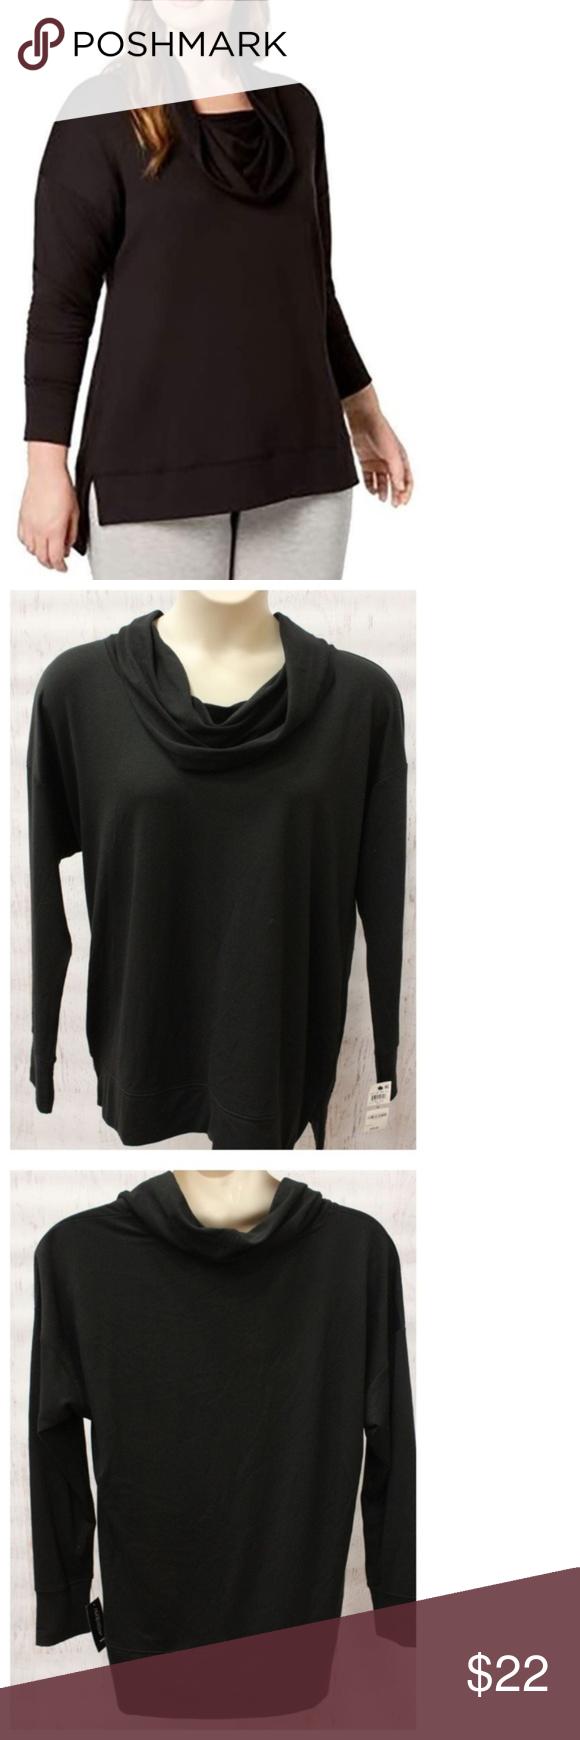 Womens Black Ideology Short Sleeve Cowl Neck Shirt Shirt Size 1X NWT NEW